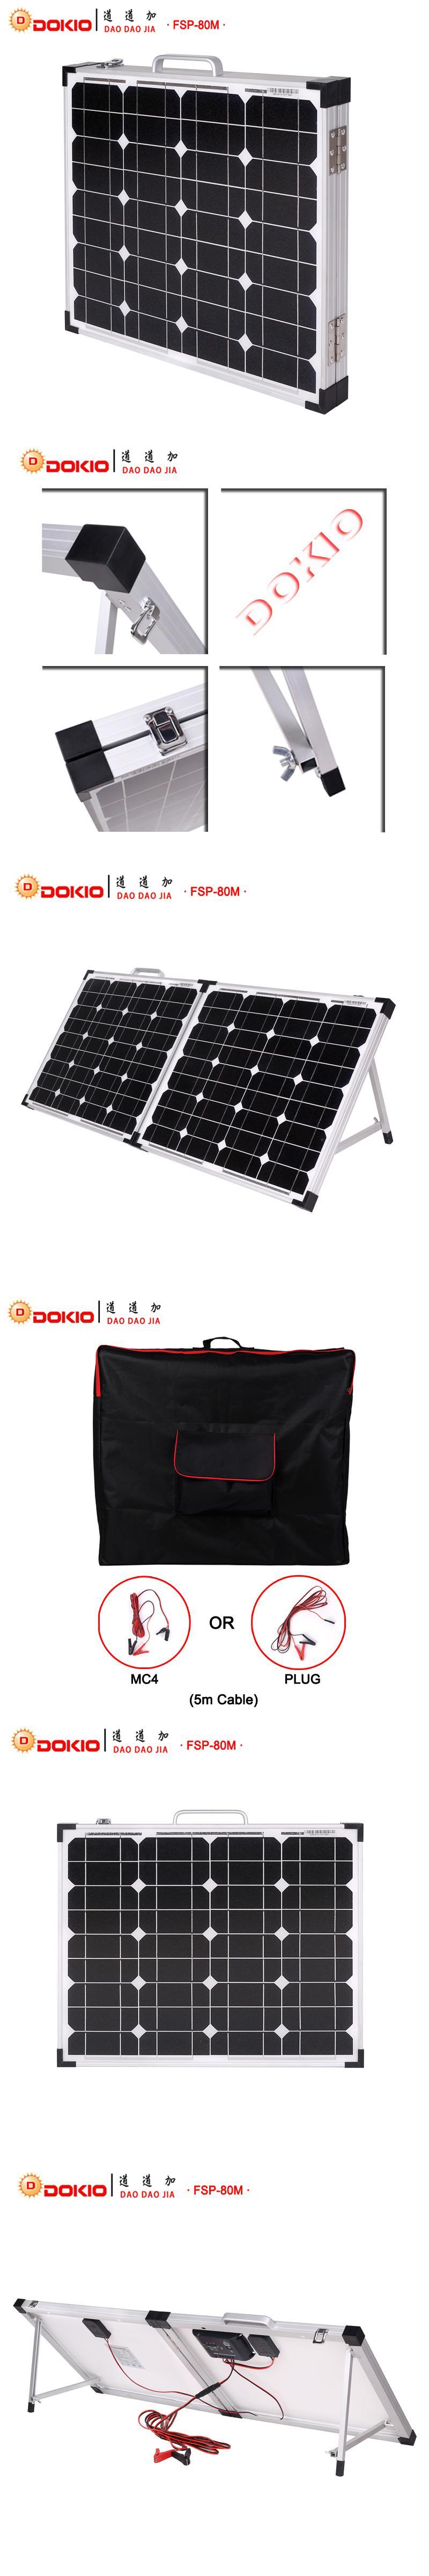 dokio brand foldable solar panel china 80w 2pcs x40w 10a 12v 24v